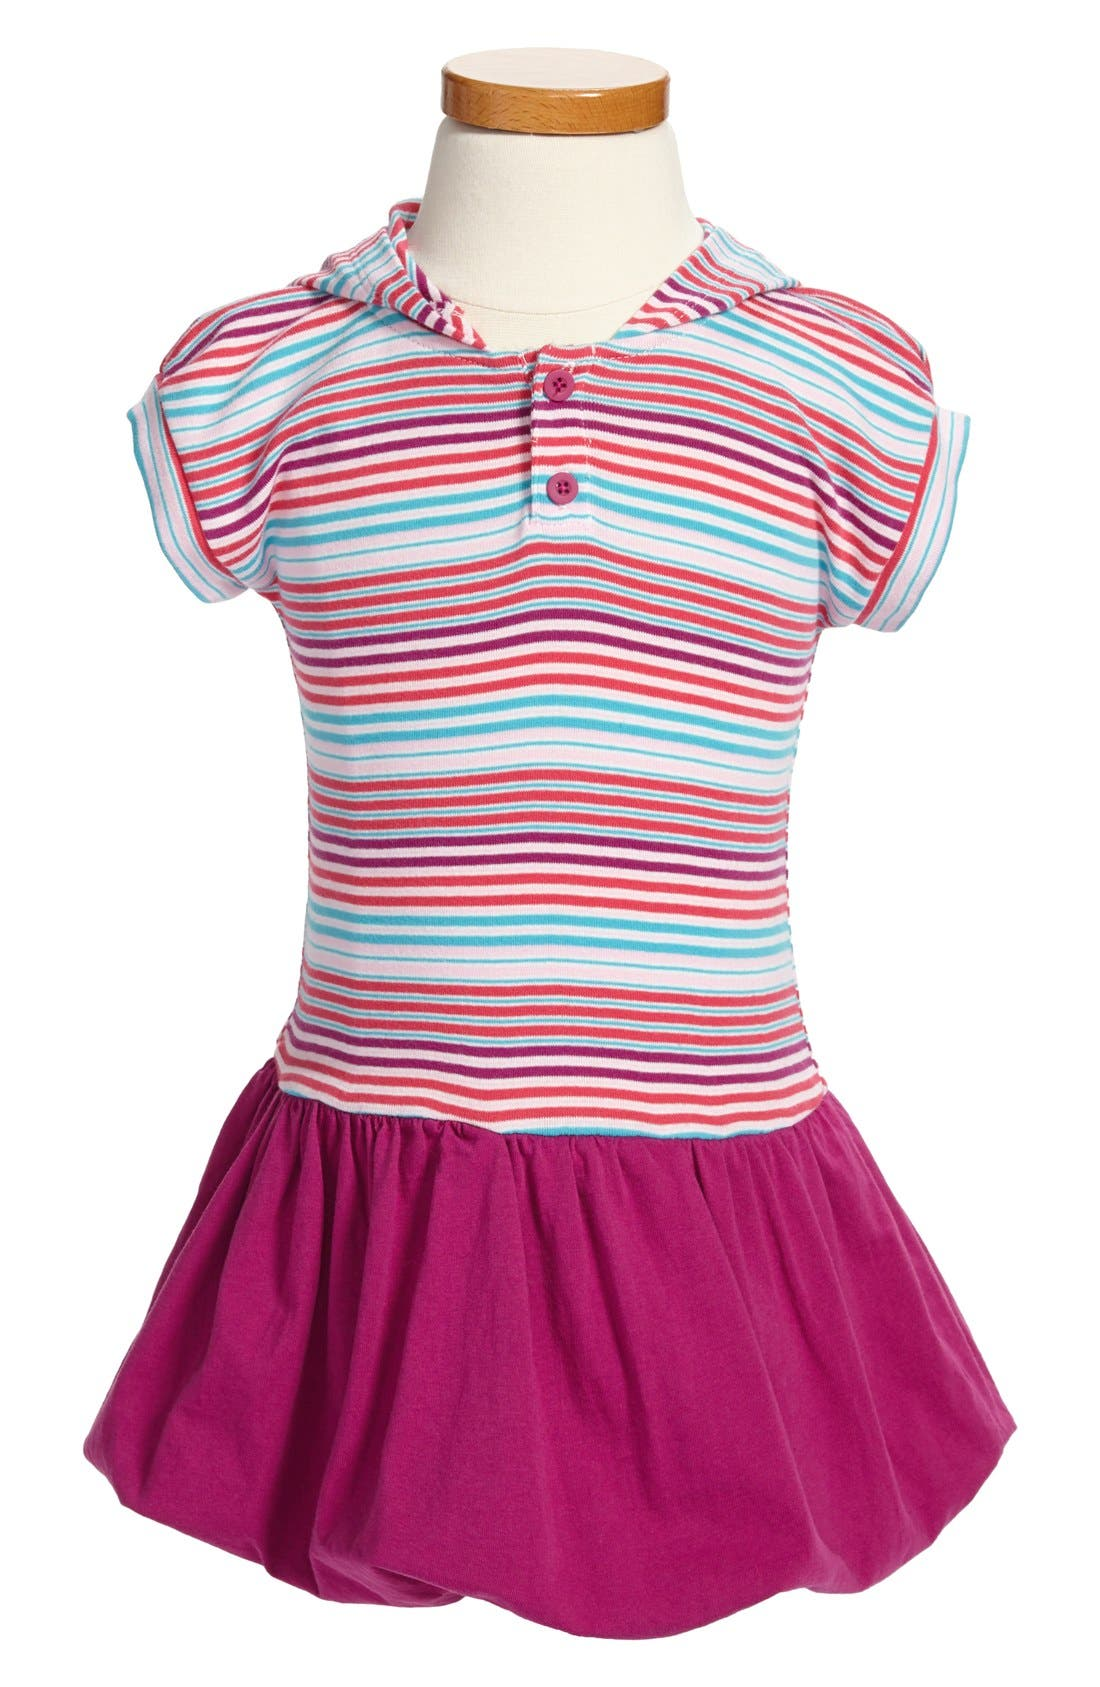 Alternate Image 1 Selected - Tea Collection 'Market Stripe' Bubble Dress (Toddler Girls)